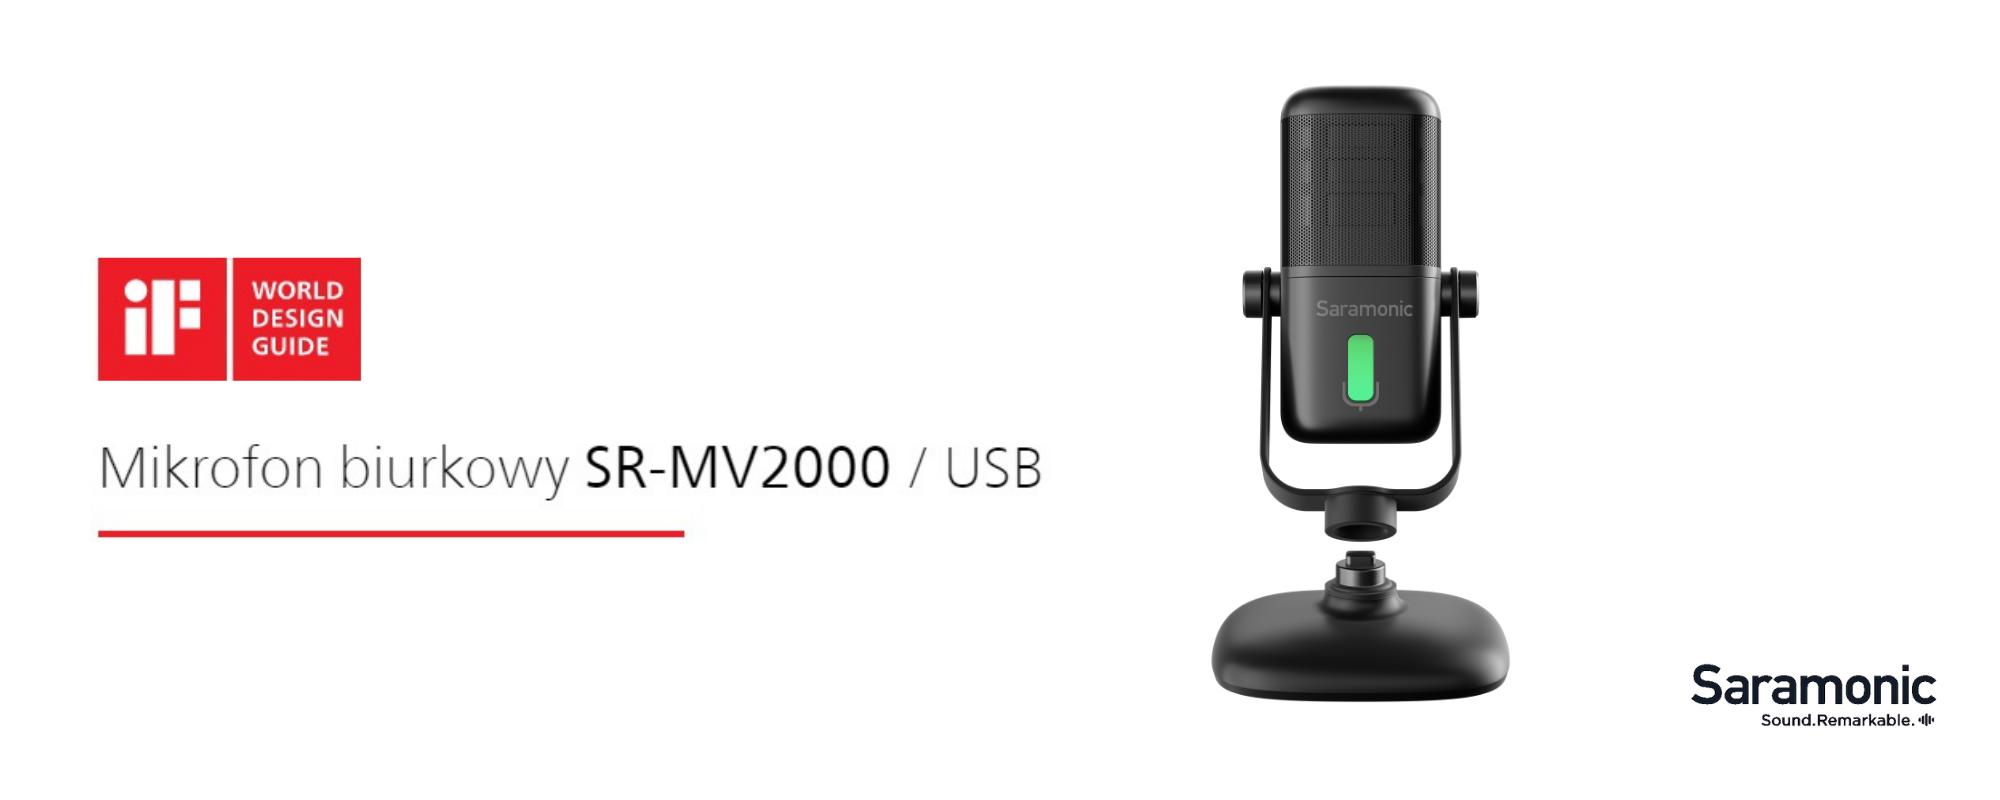 Mikrofon do podcastów Saramonic SR-MV2000